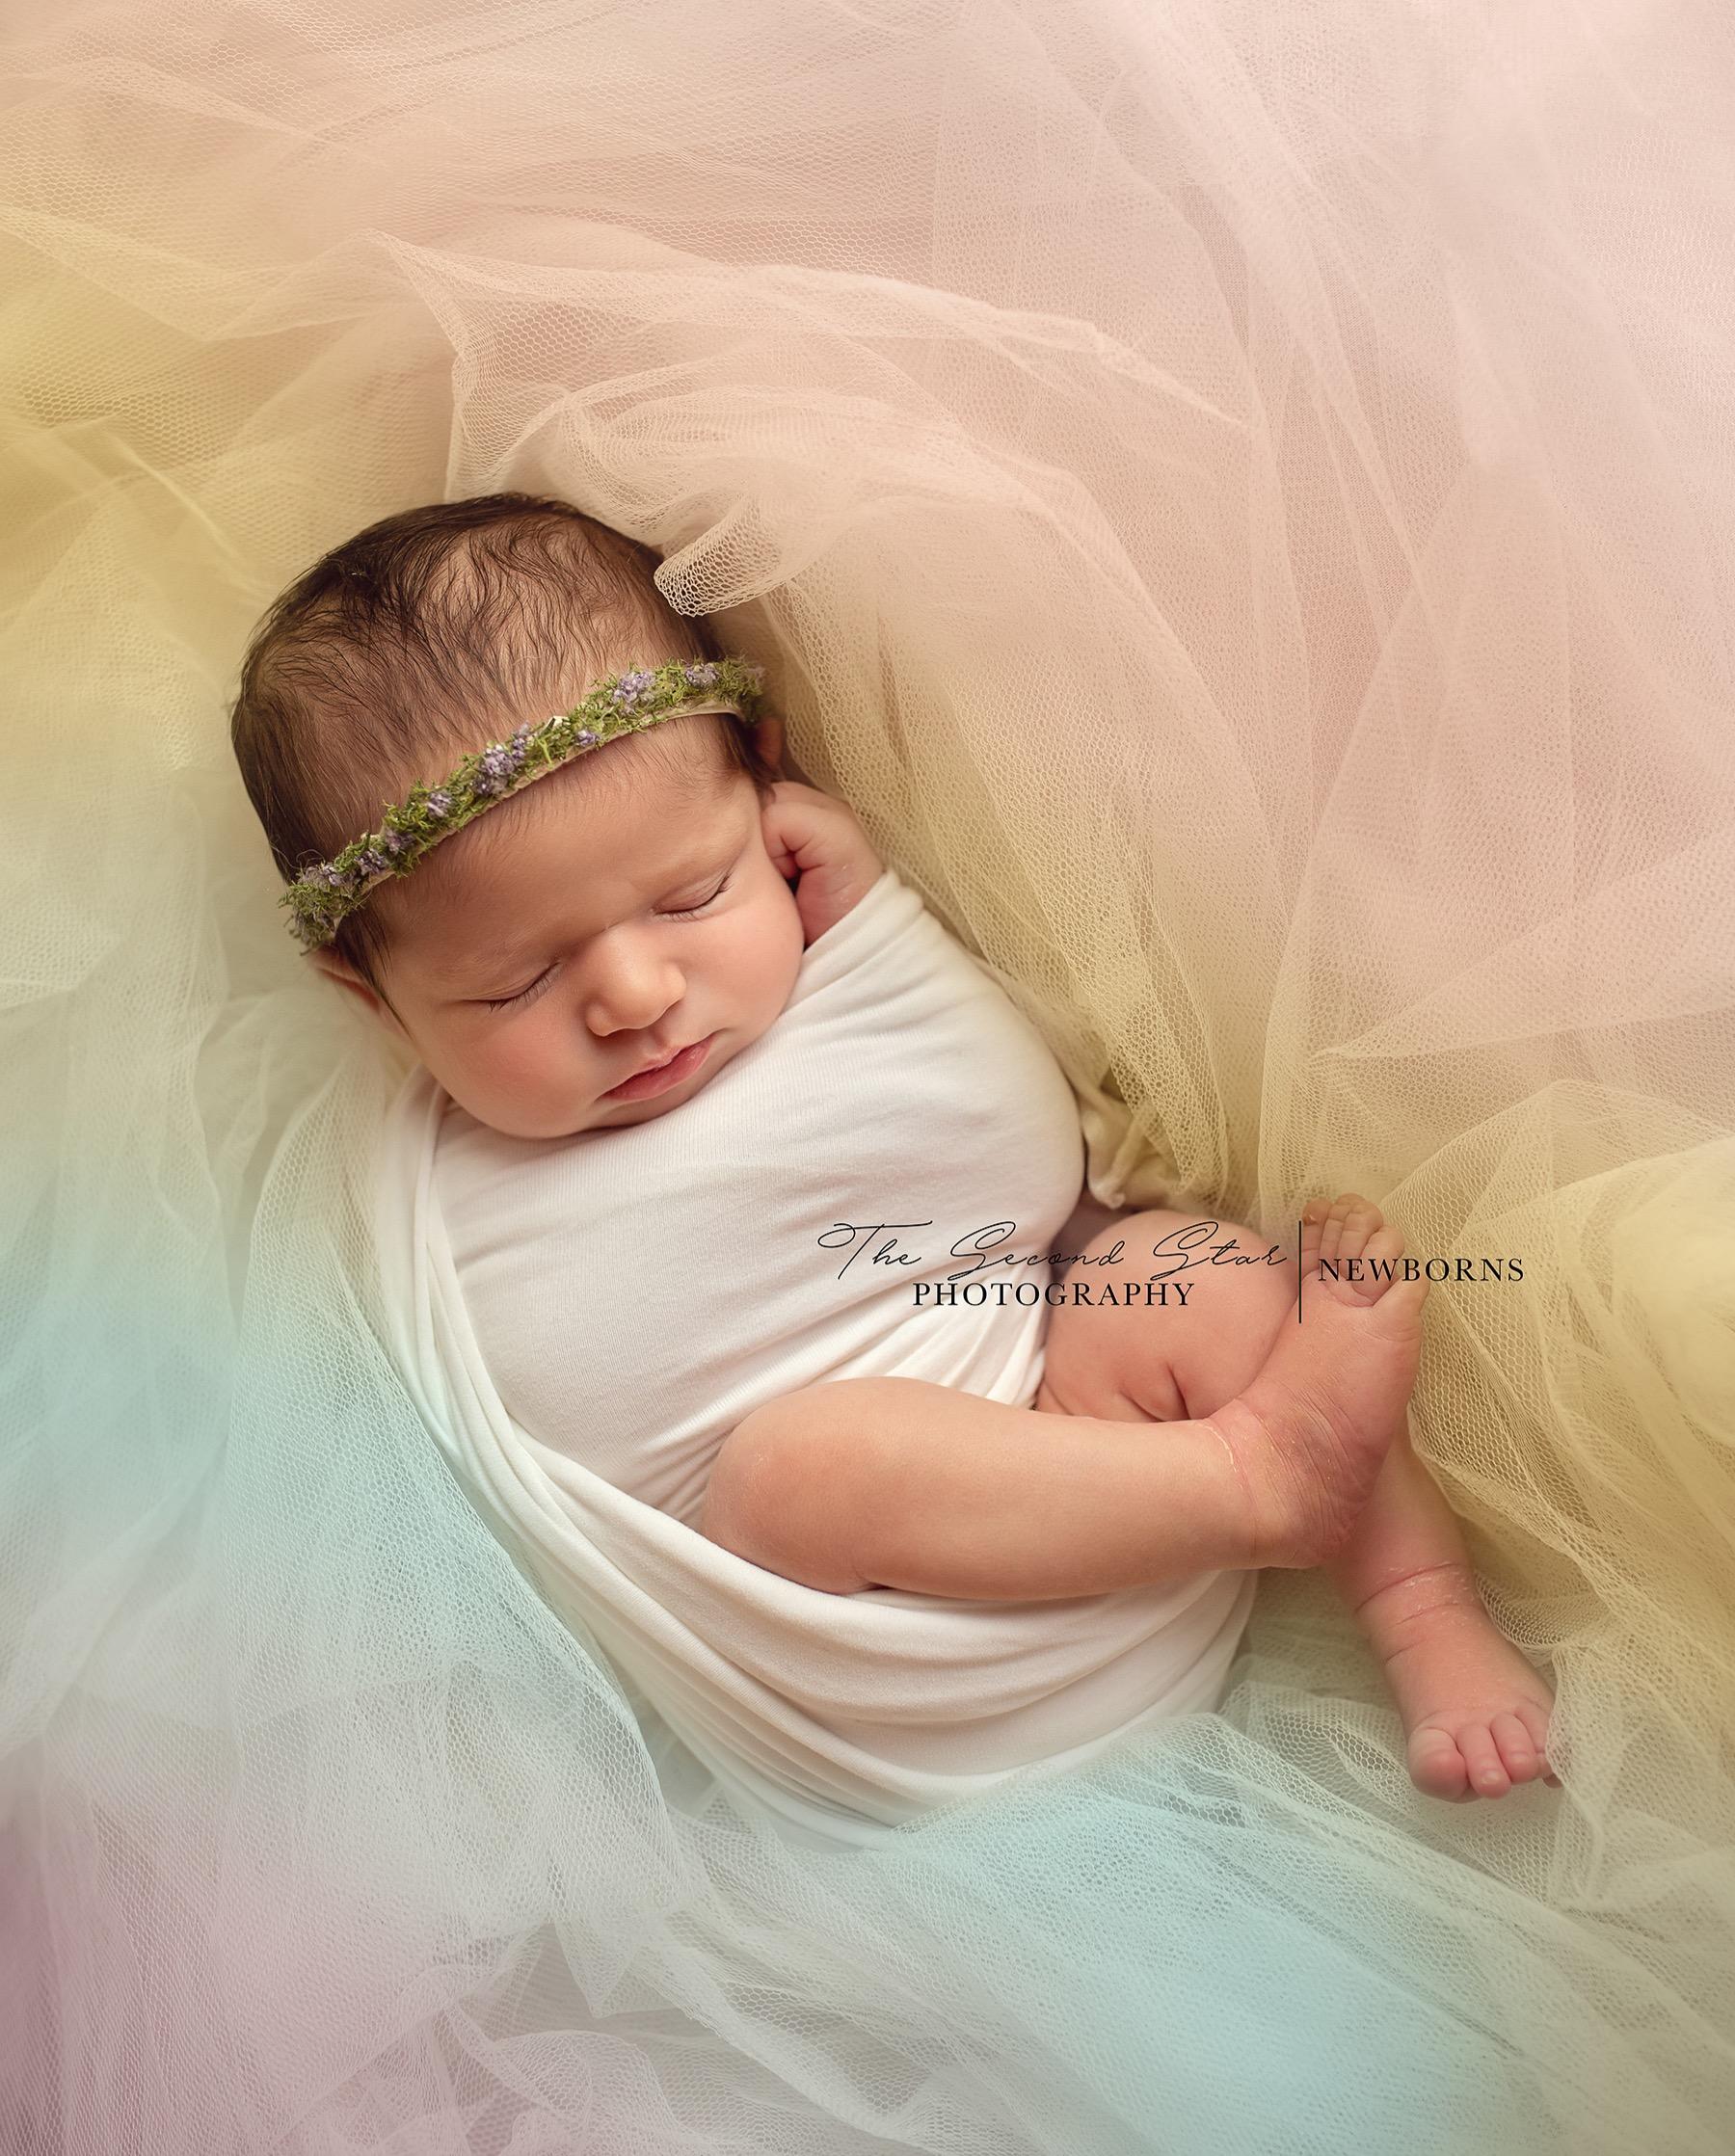 rainbow baby newborn photography Bicester, Oxfordshire